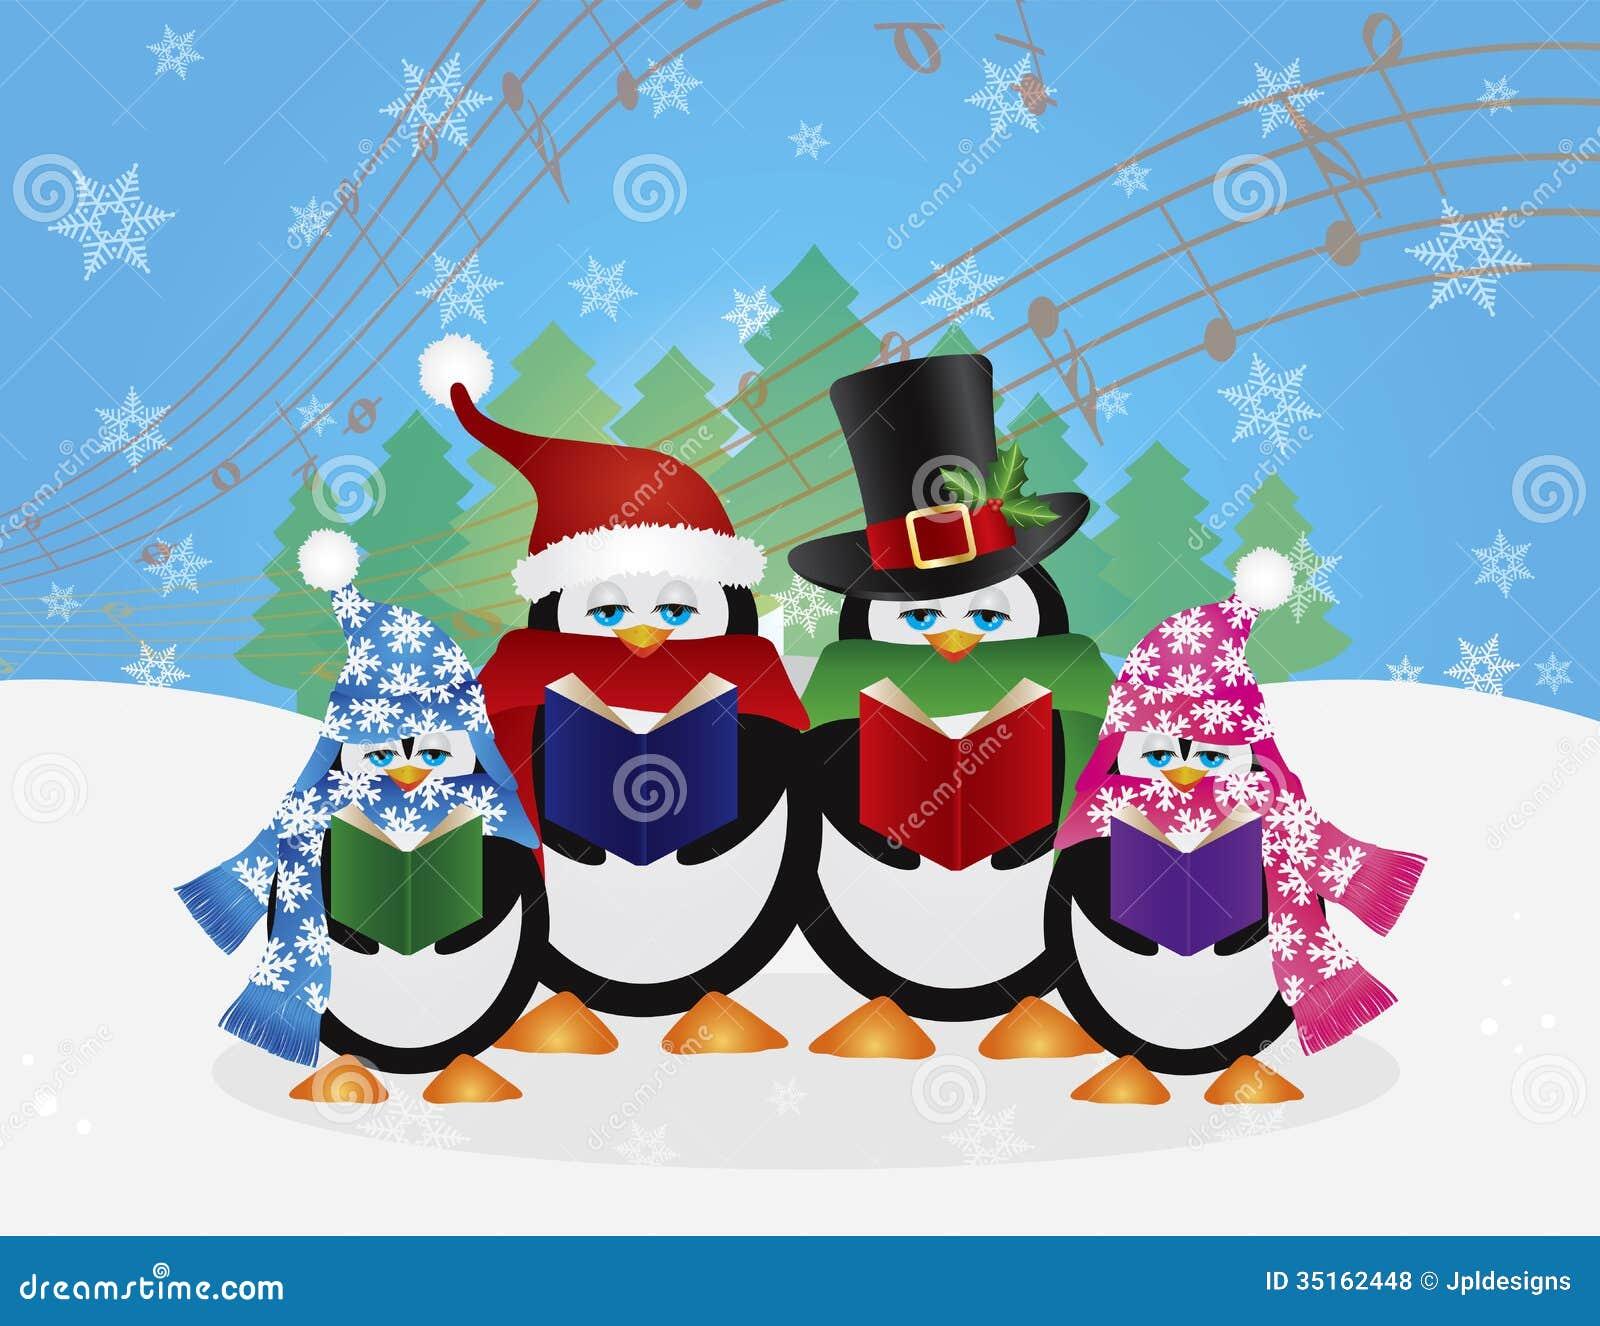 Lighted 8 Song Musical Holiday Christmas Carolers Choir: Penguins Christmas Carolers Snow Scene Illustration Stock